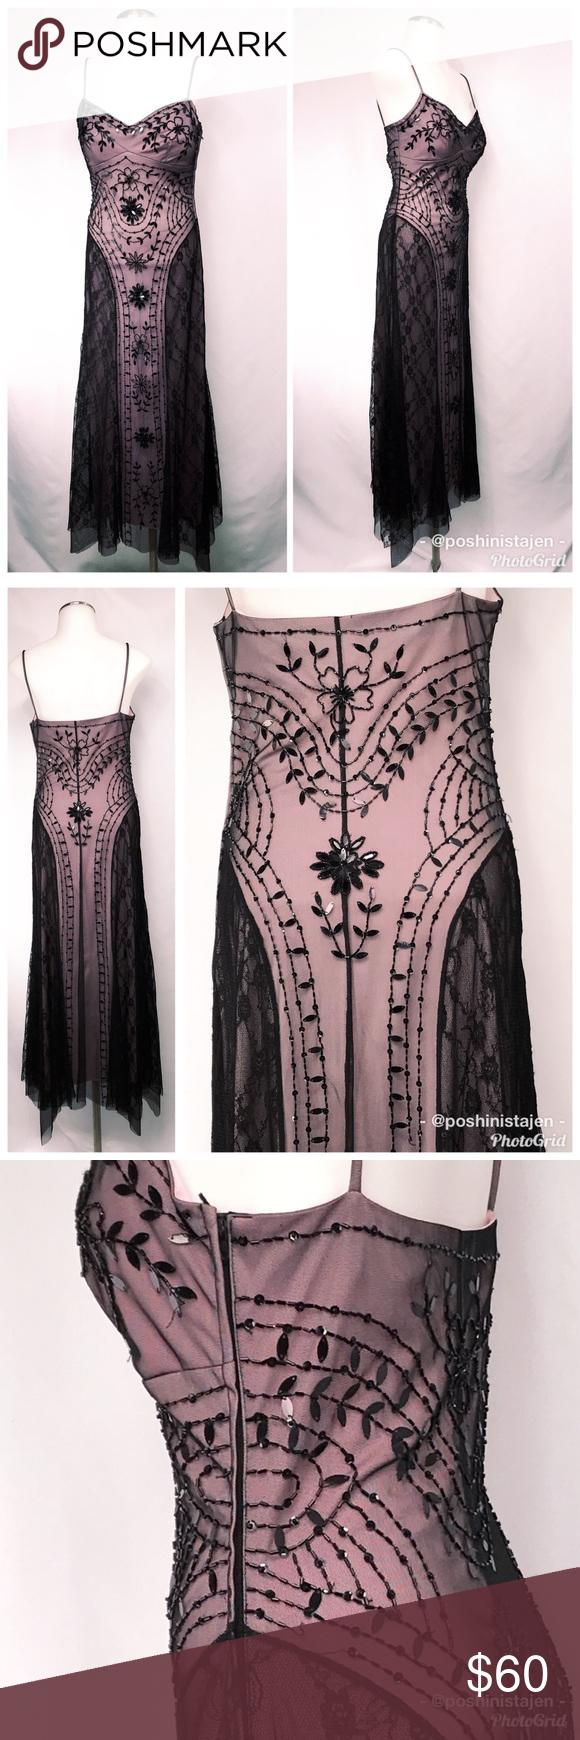 masquerade black u pink prom gown sz masquerade dresses